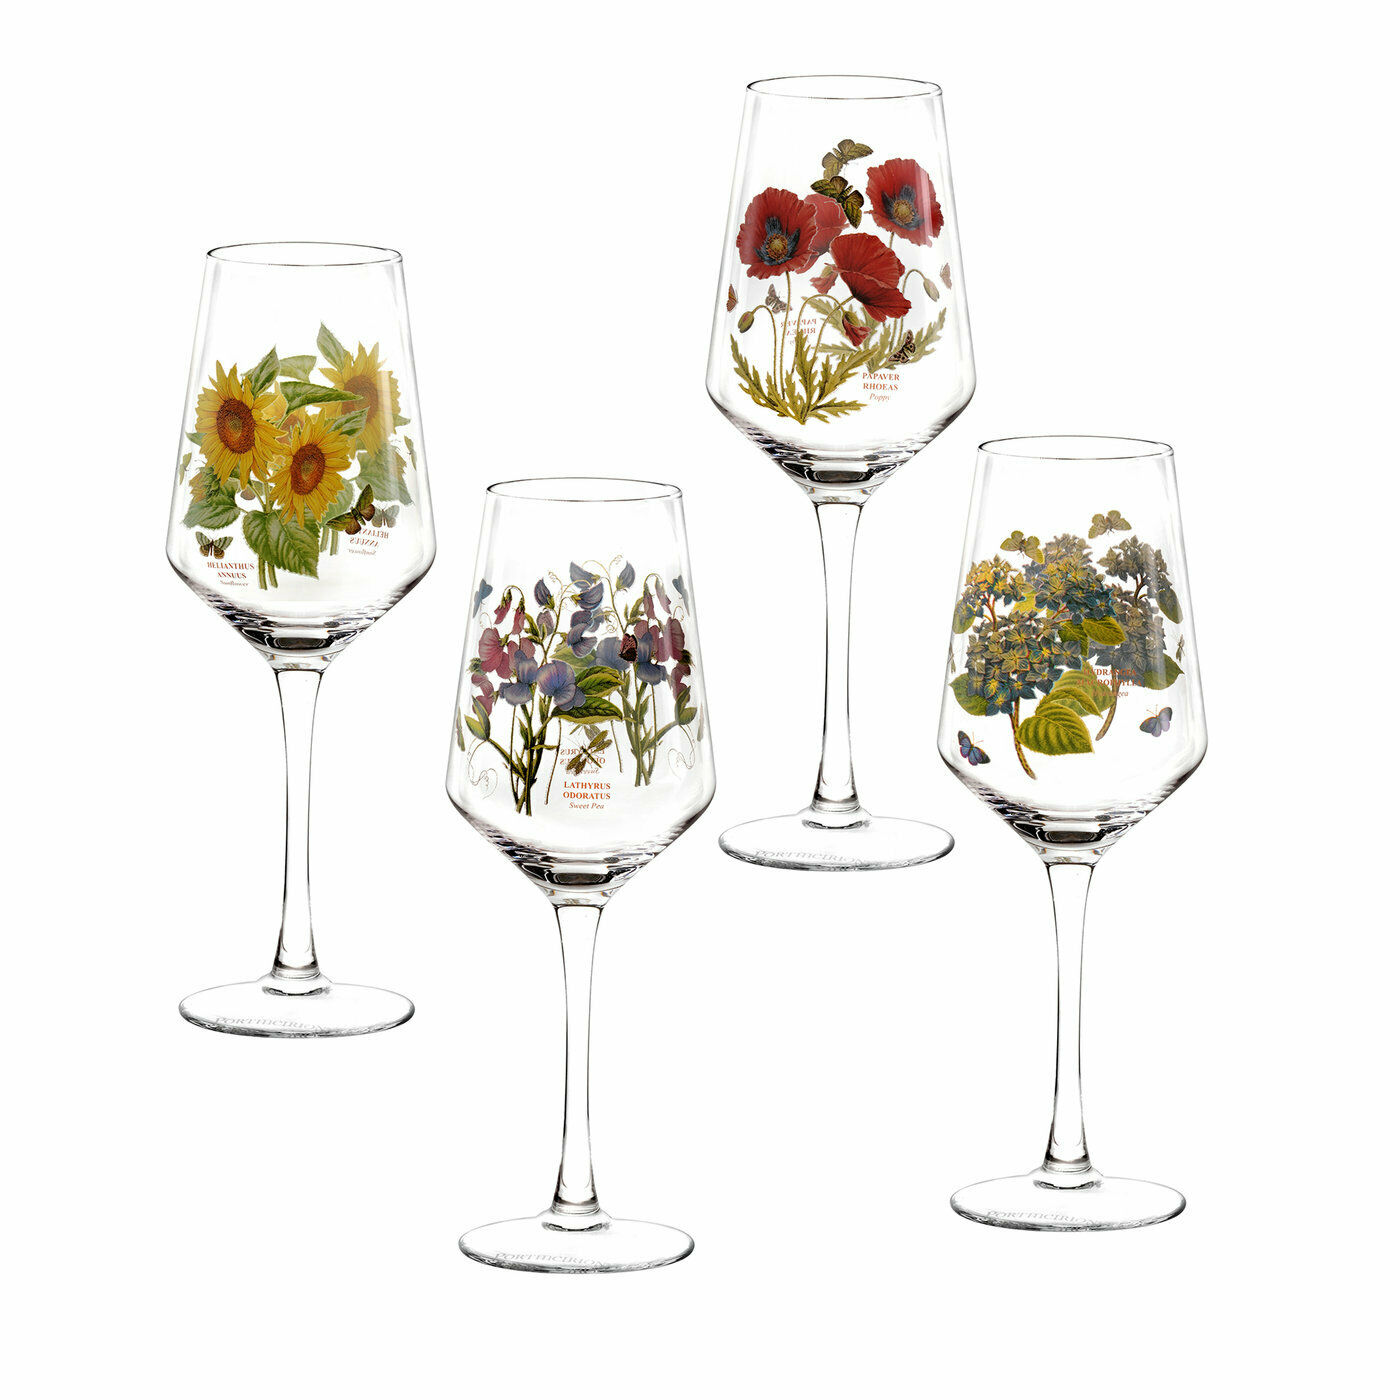 Portmeirion Set of 4 Botanic Garden Wine Glasses Floral Decorated Stemware Glass